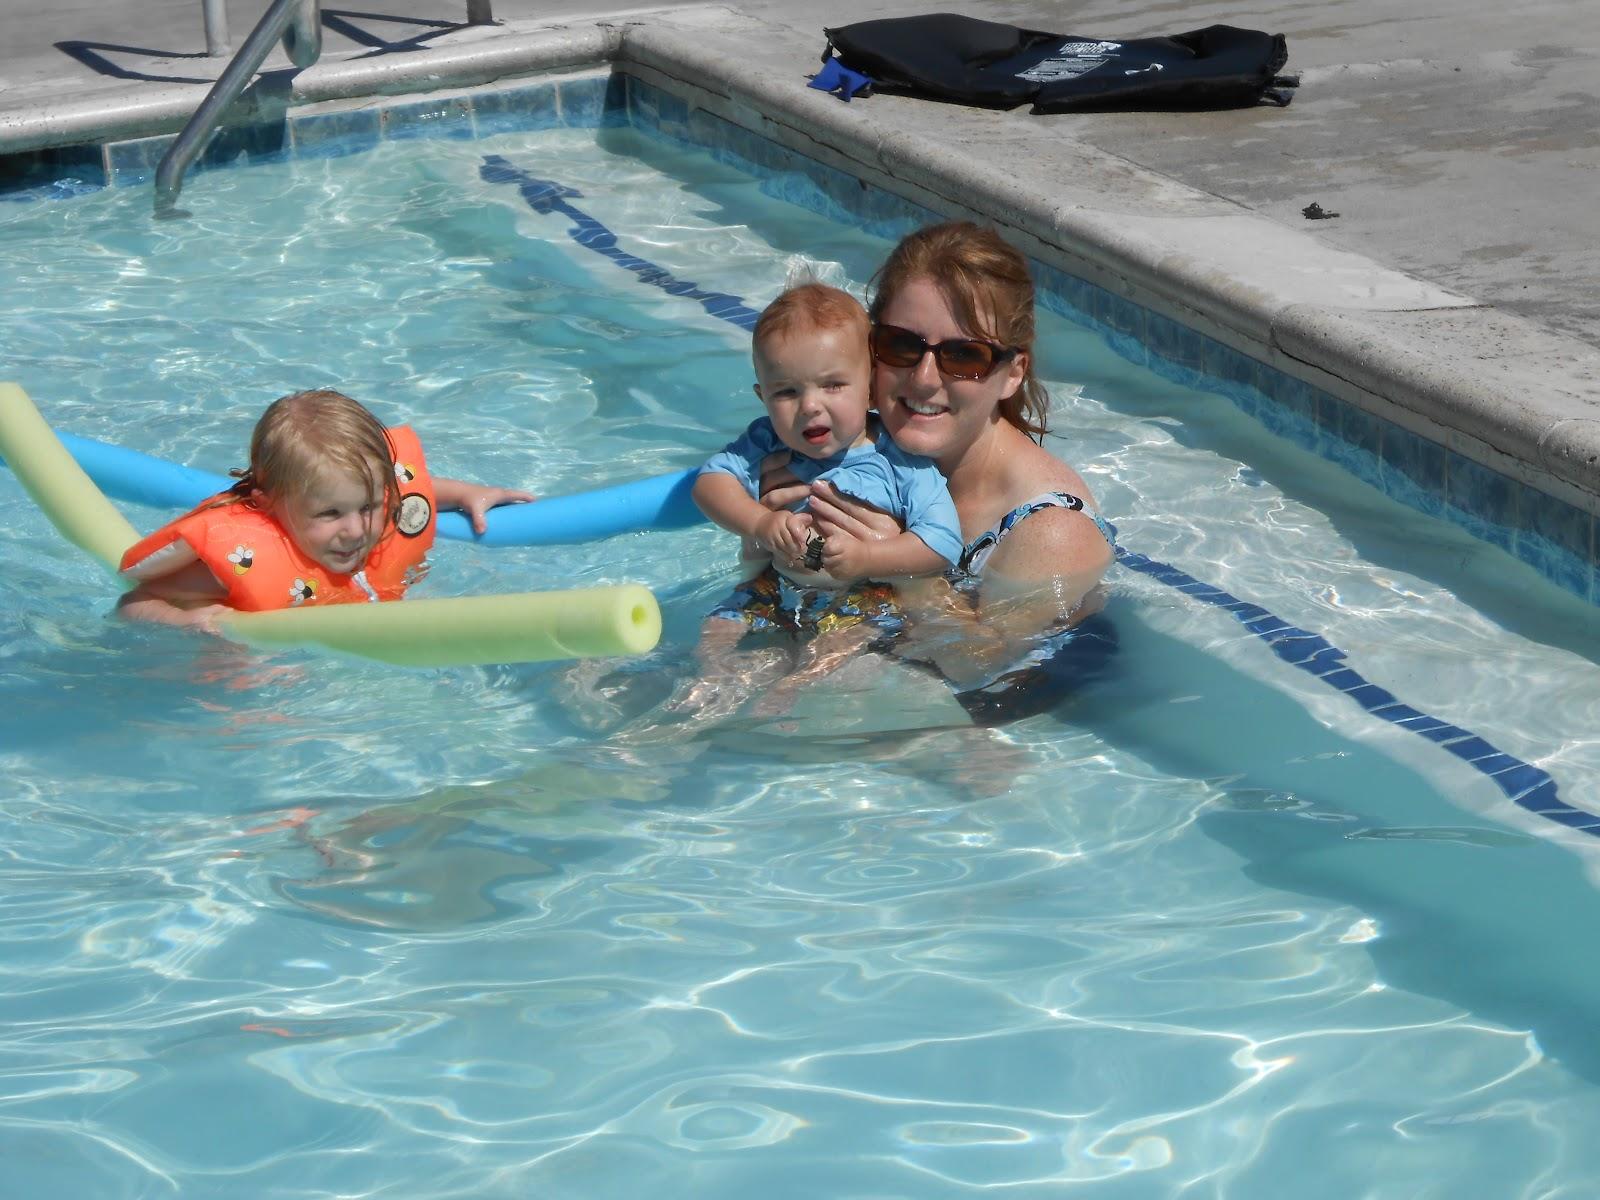 Ammon Swimming Pool: Rachel Fuhriman: Summer Fun